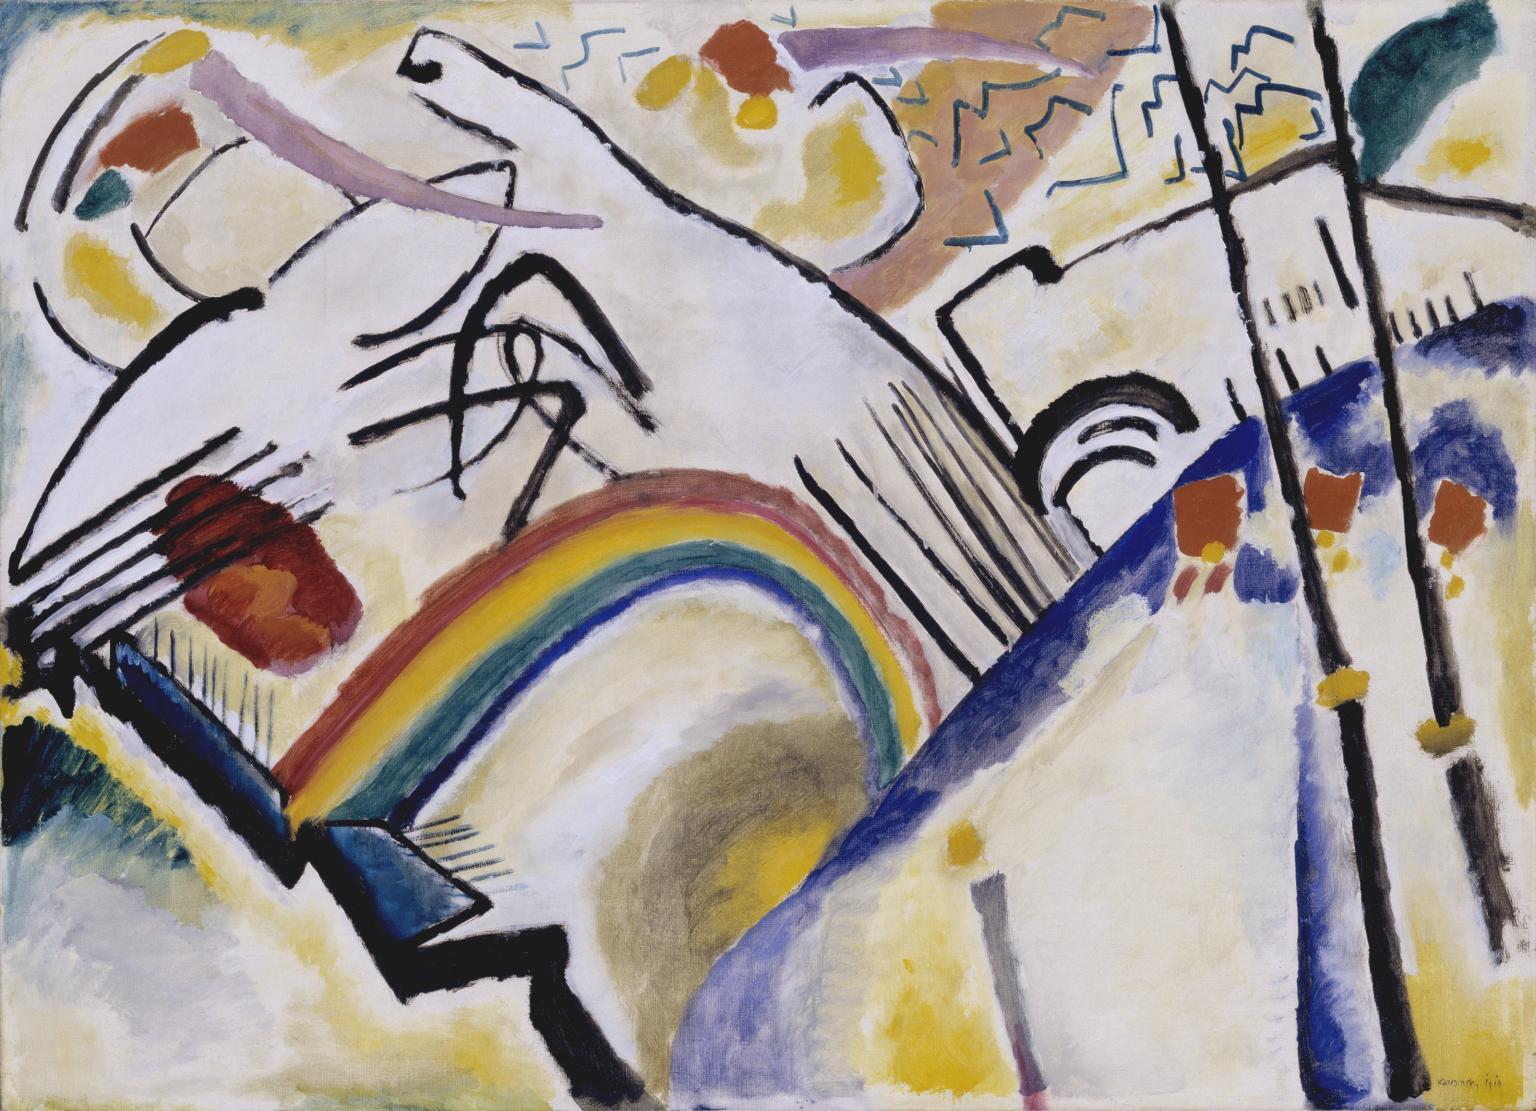 Abstract art cossacks 1910-1 by wassily kandinsky